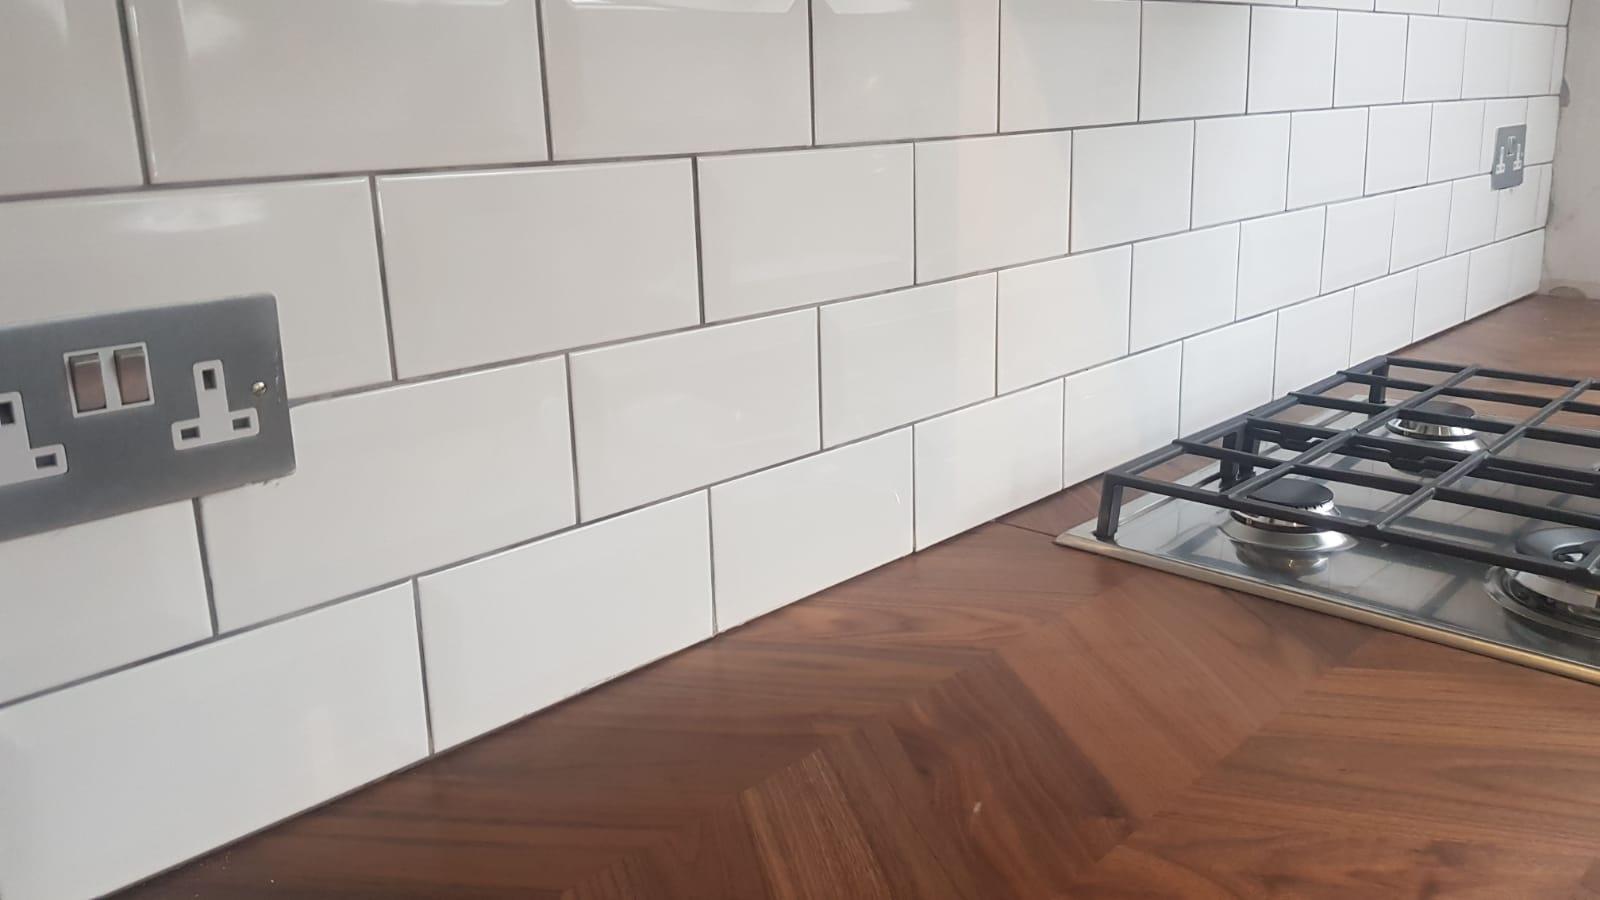 Sunbury on Thames kitchen refurbishment new tiling and worktop